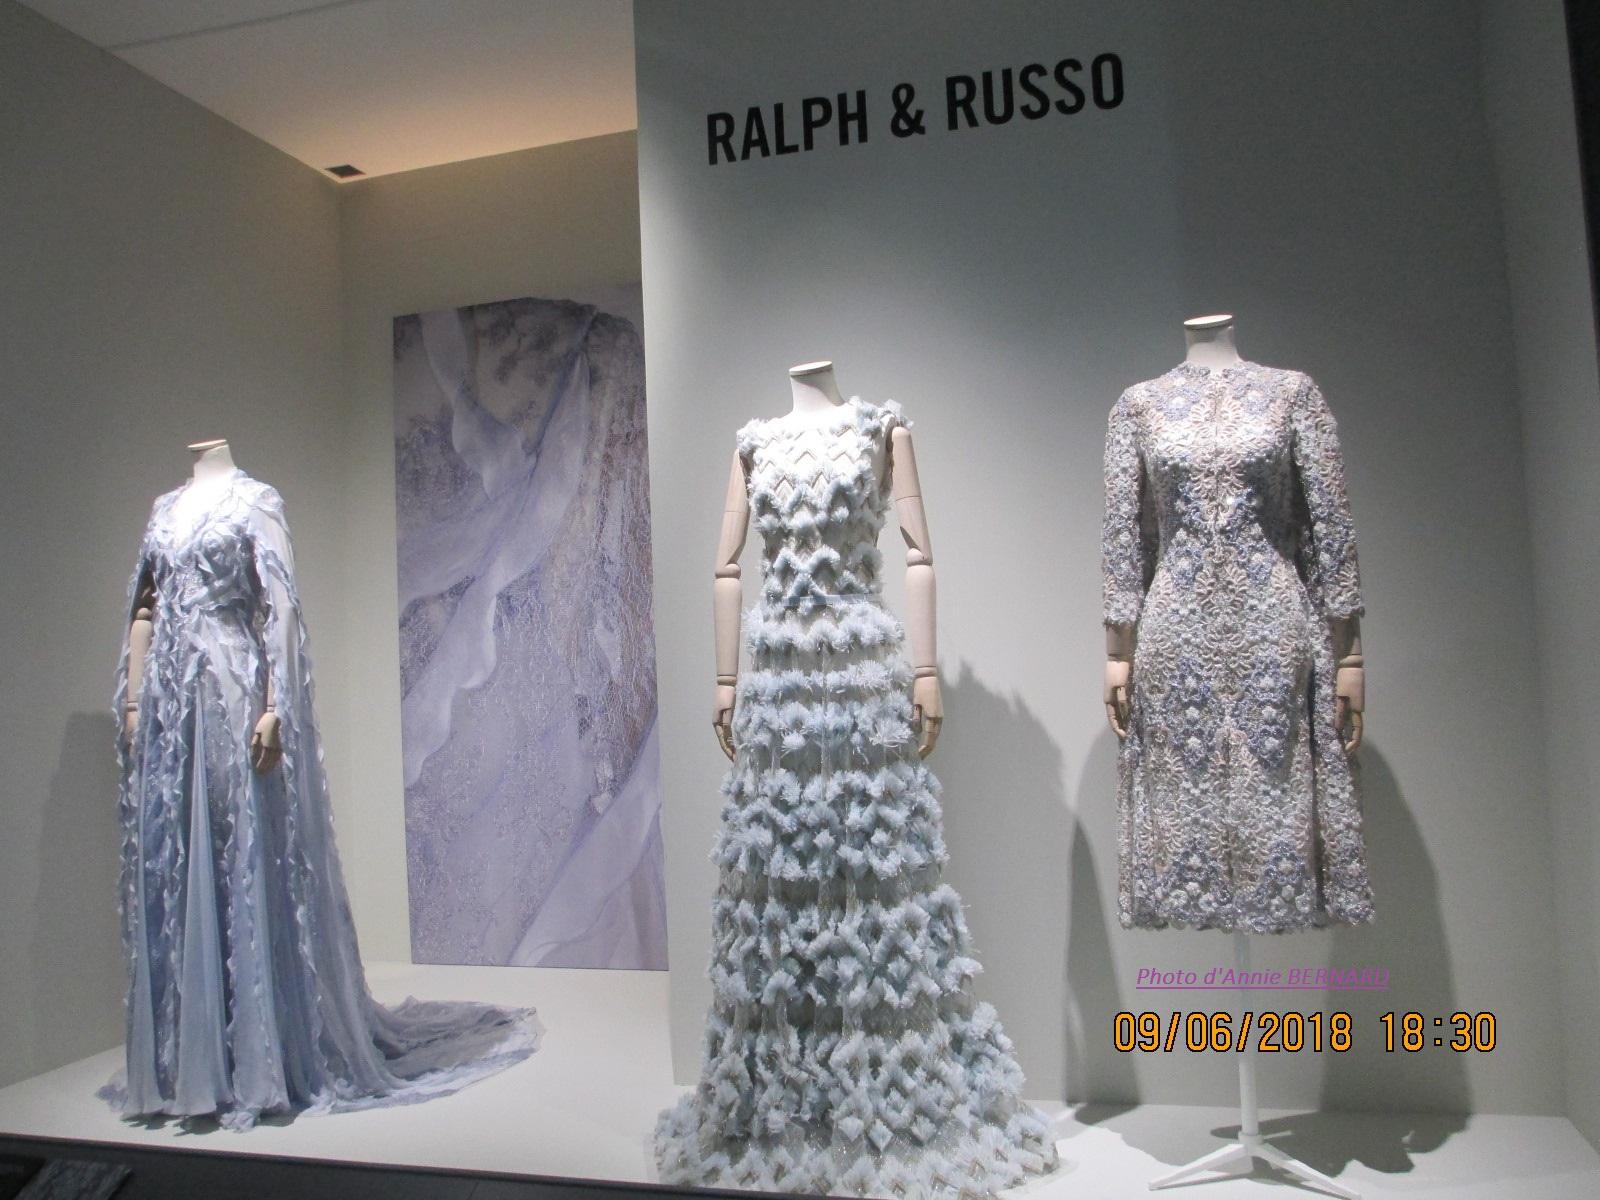 Ralph et Russo